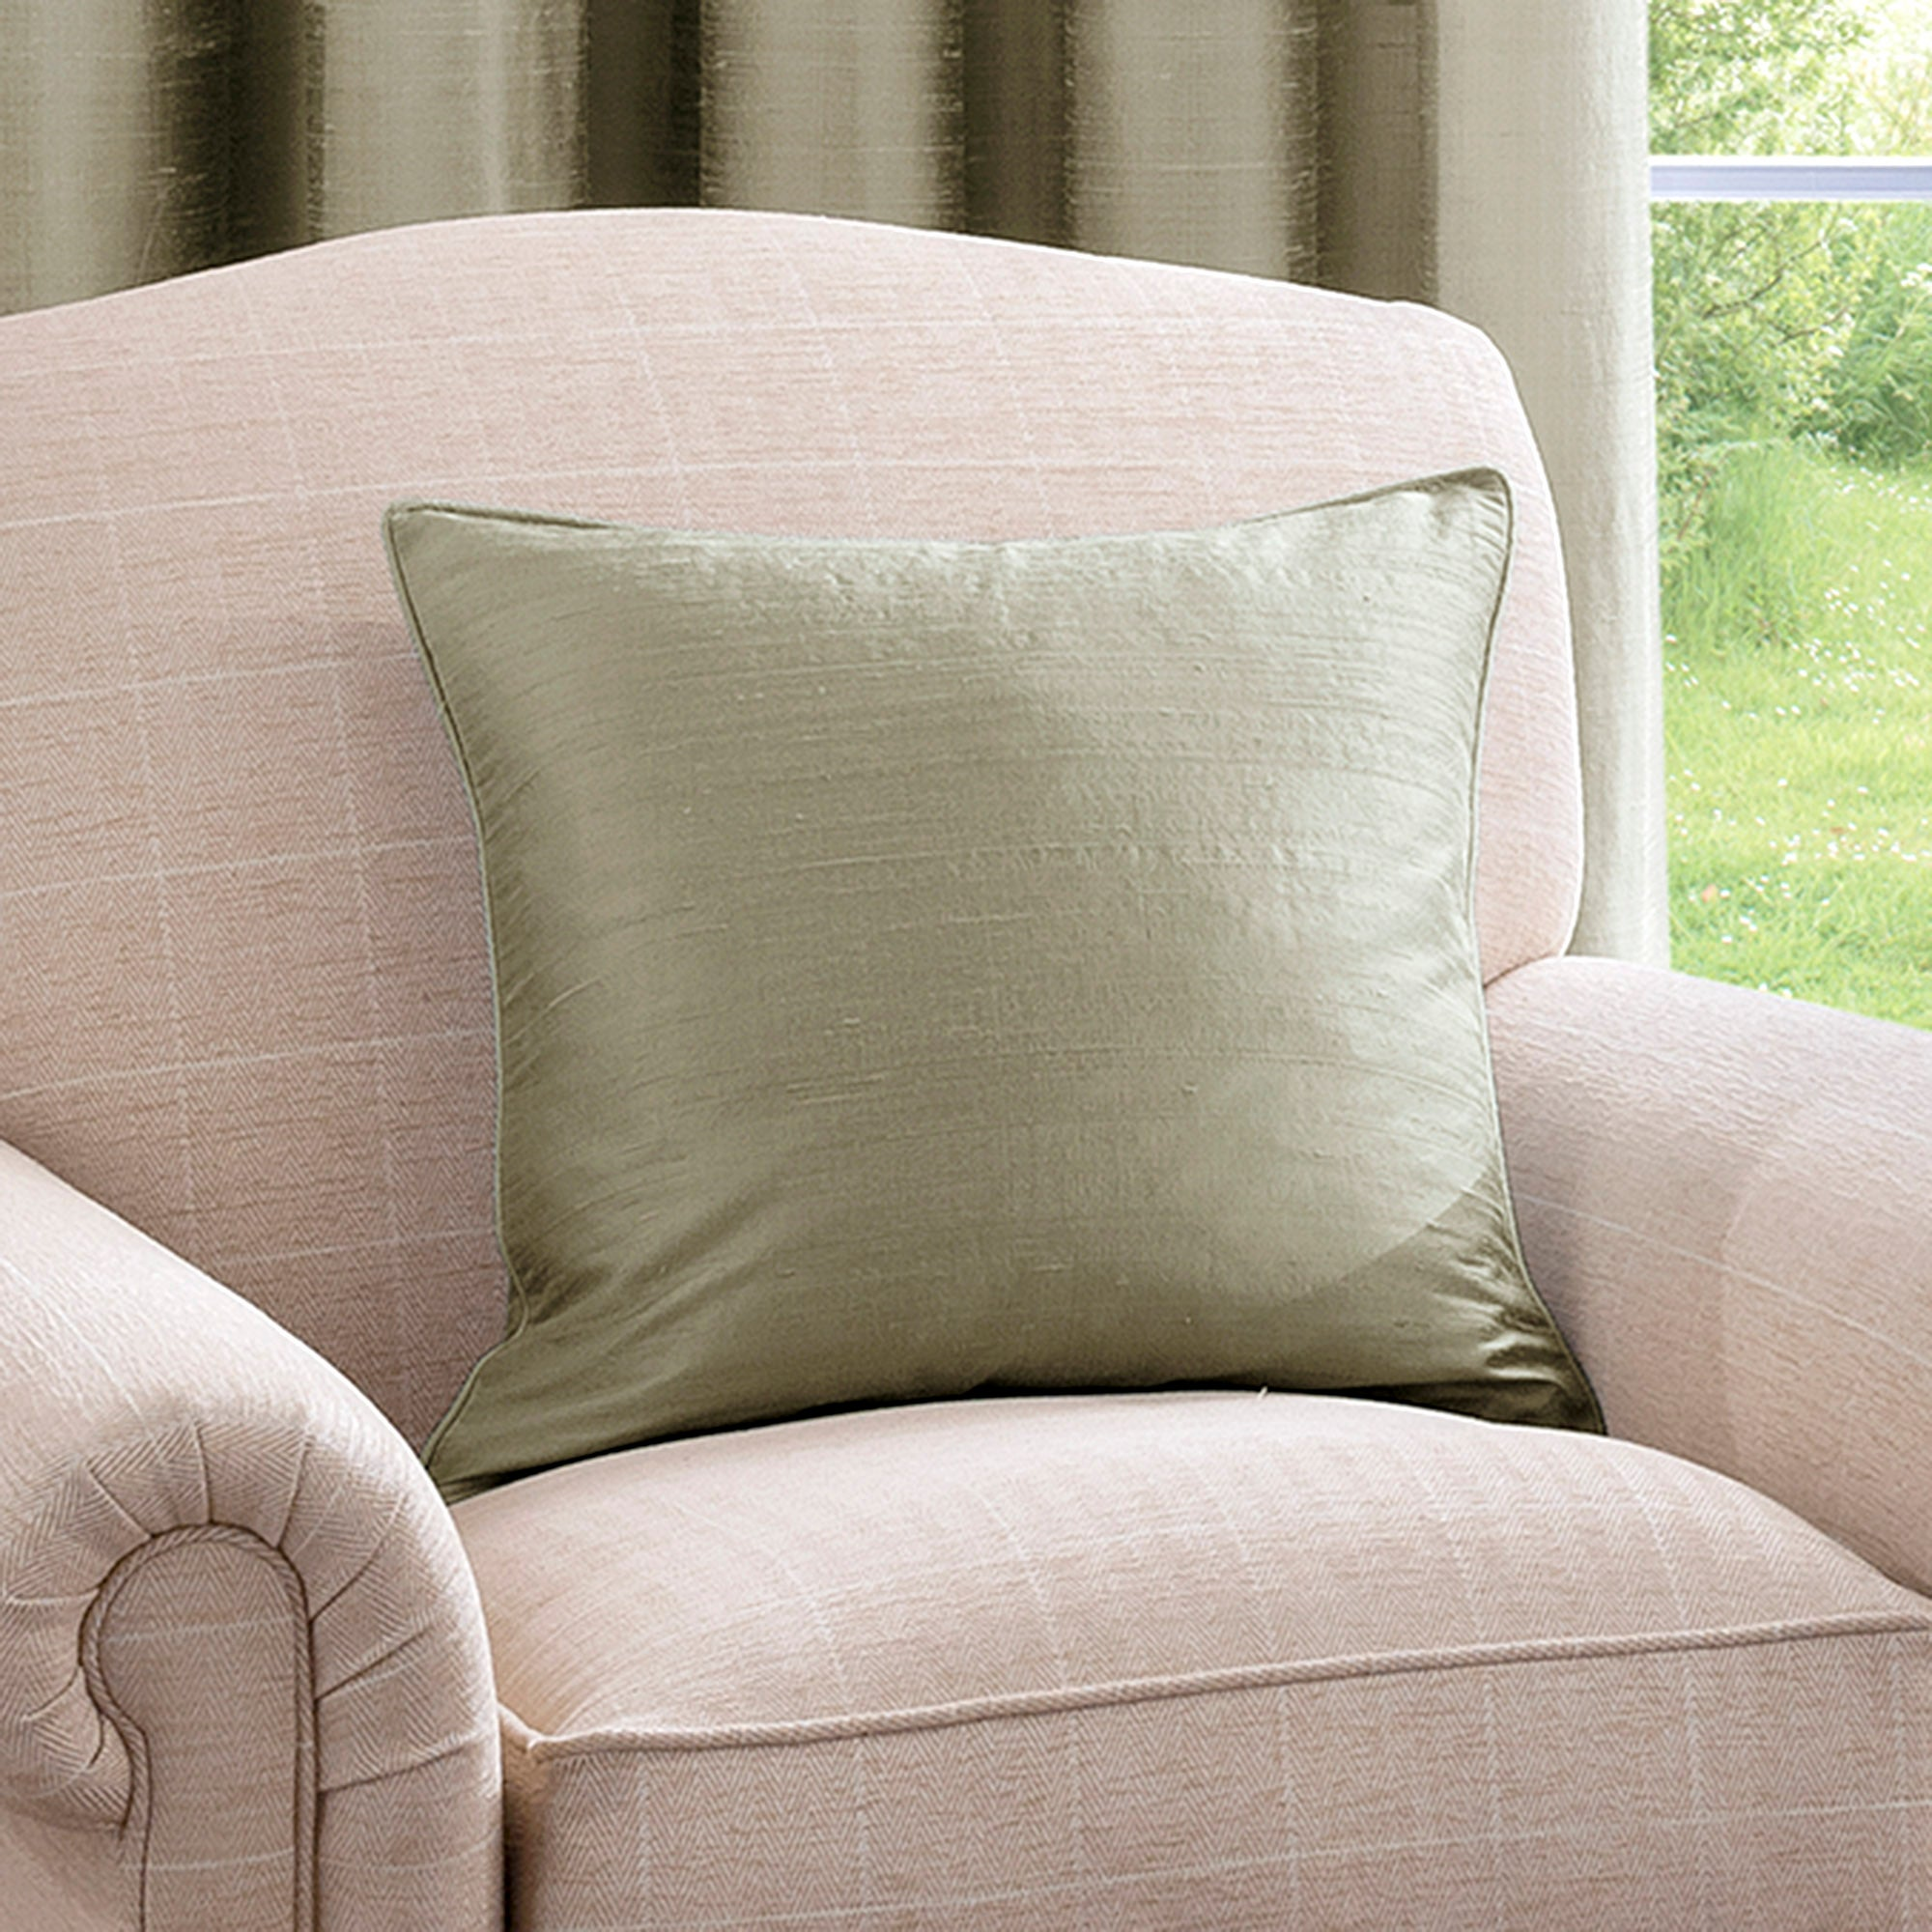 Dorma Duck Egg Beresford Collection Cushion